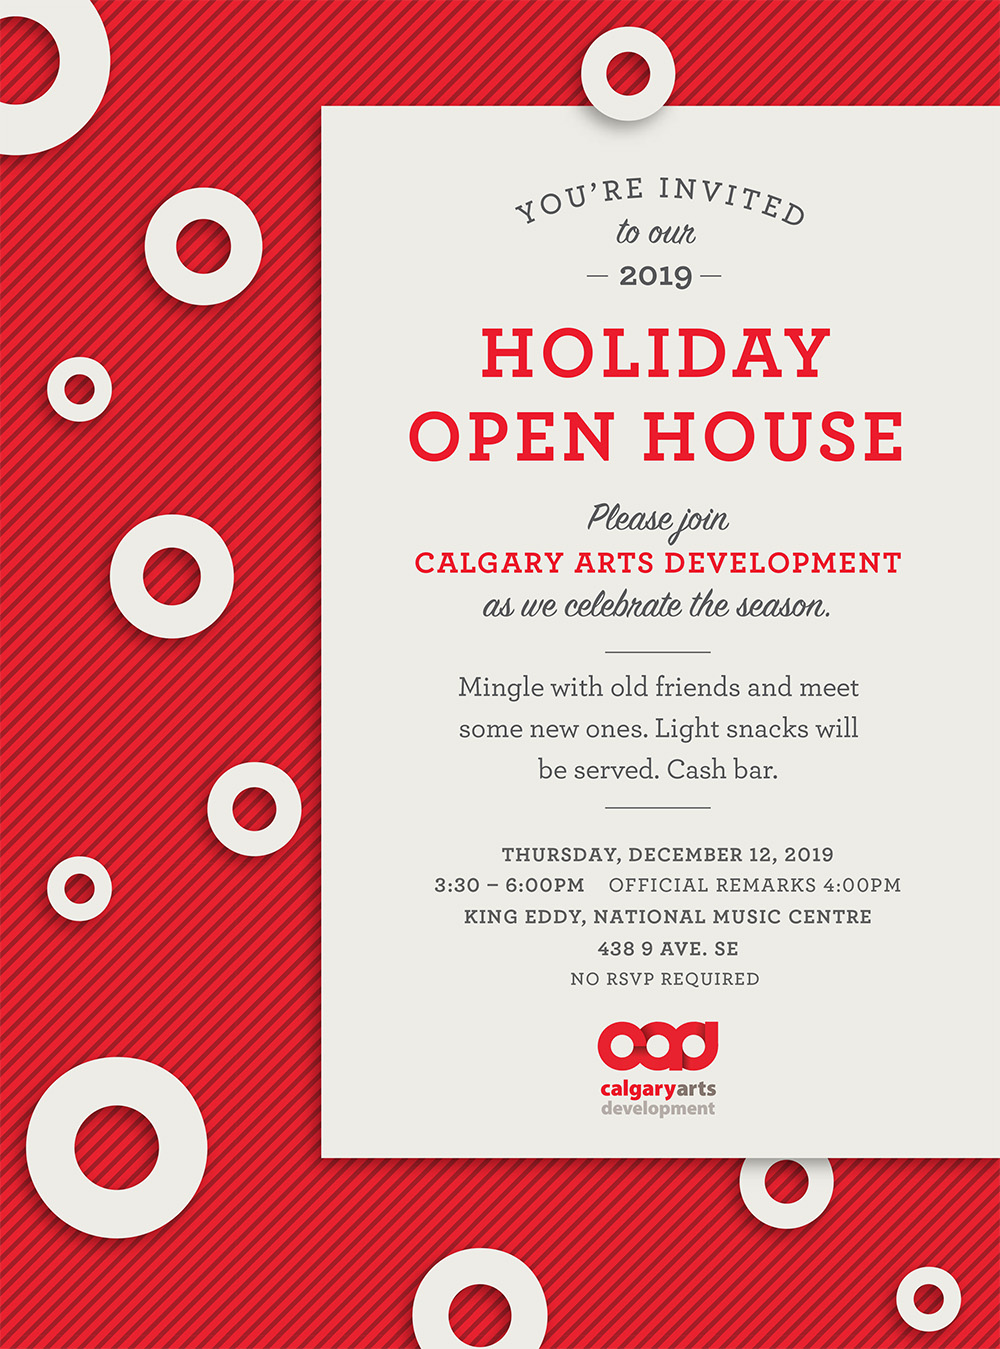 Please join Calgary Arts Development as we celebrate the season